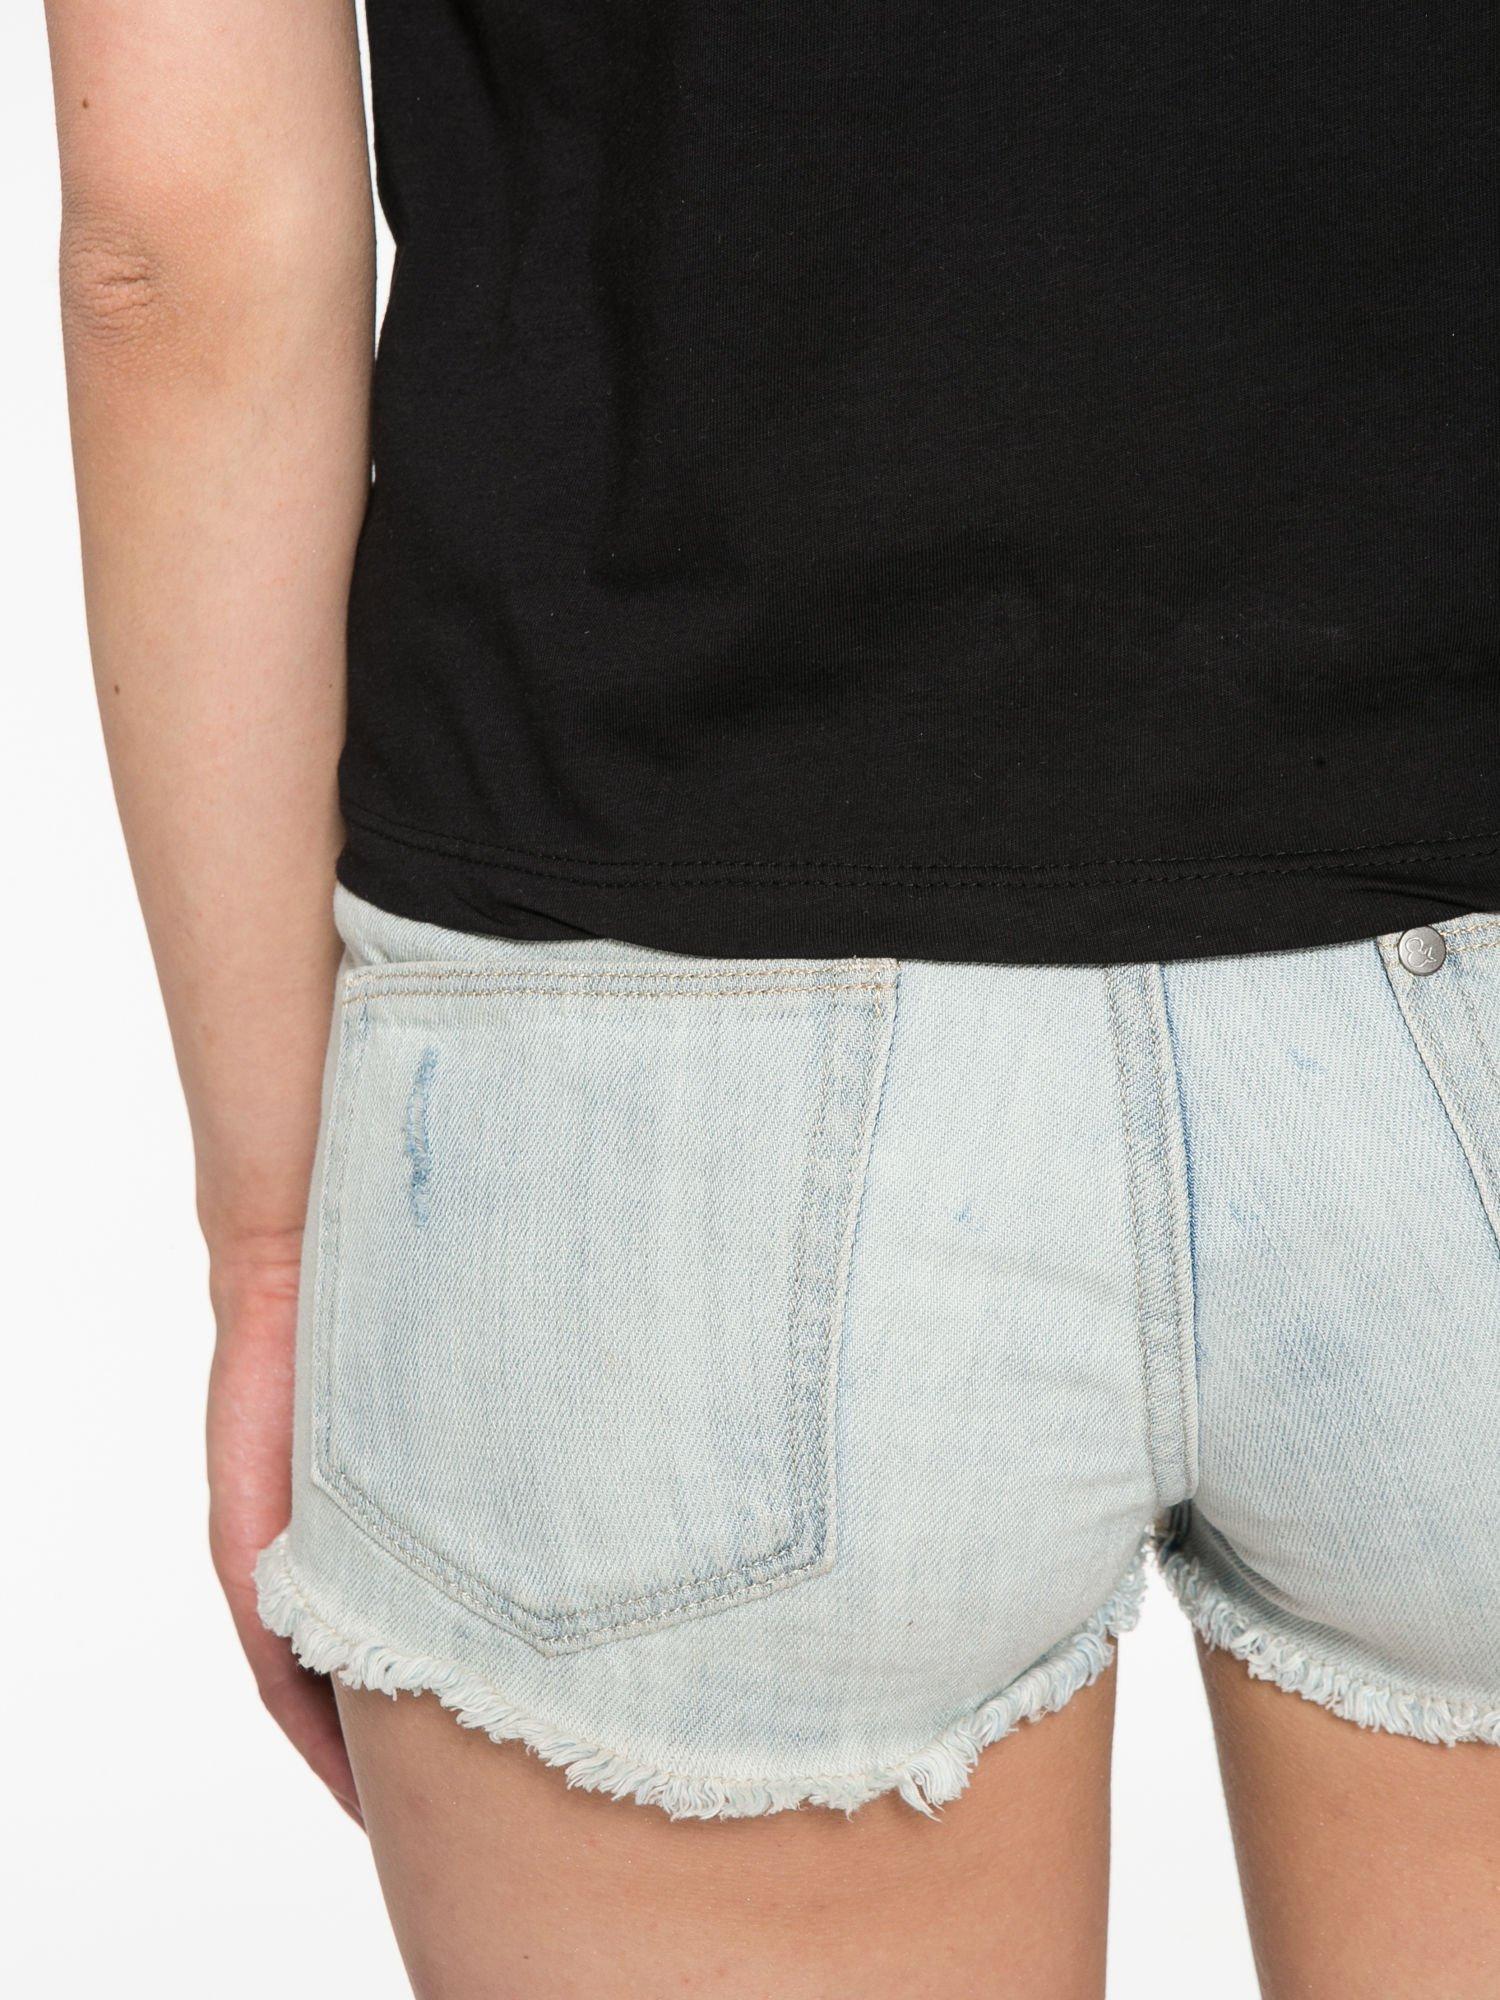 Czarny krótki t-shirt z nadrukiem stokrotek i napisem                                  zdj.                                  11